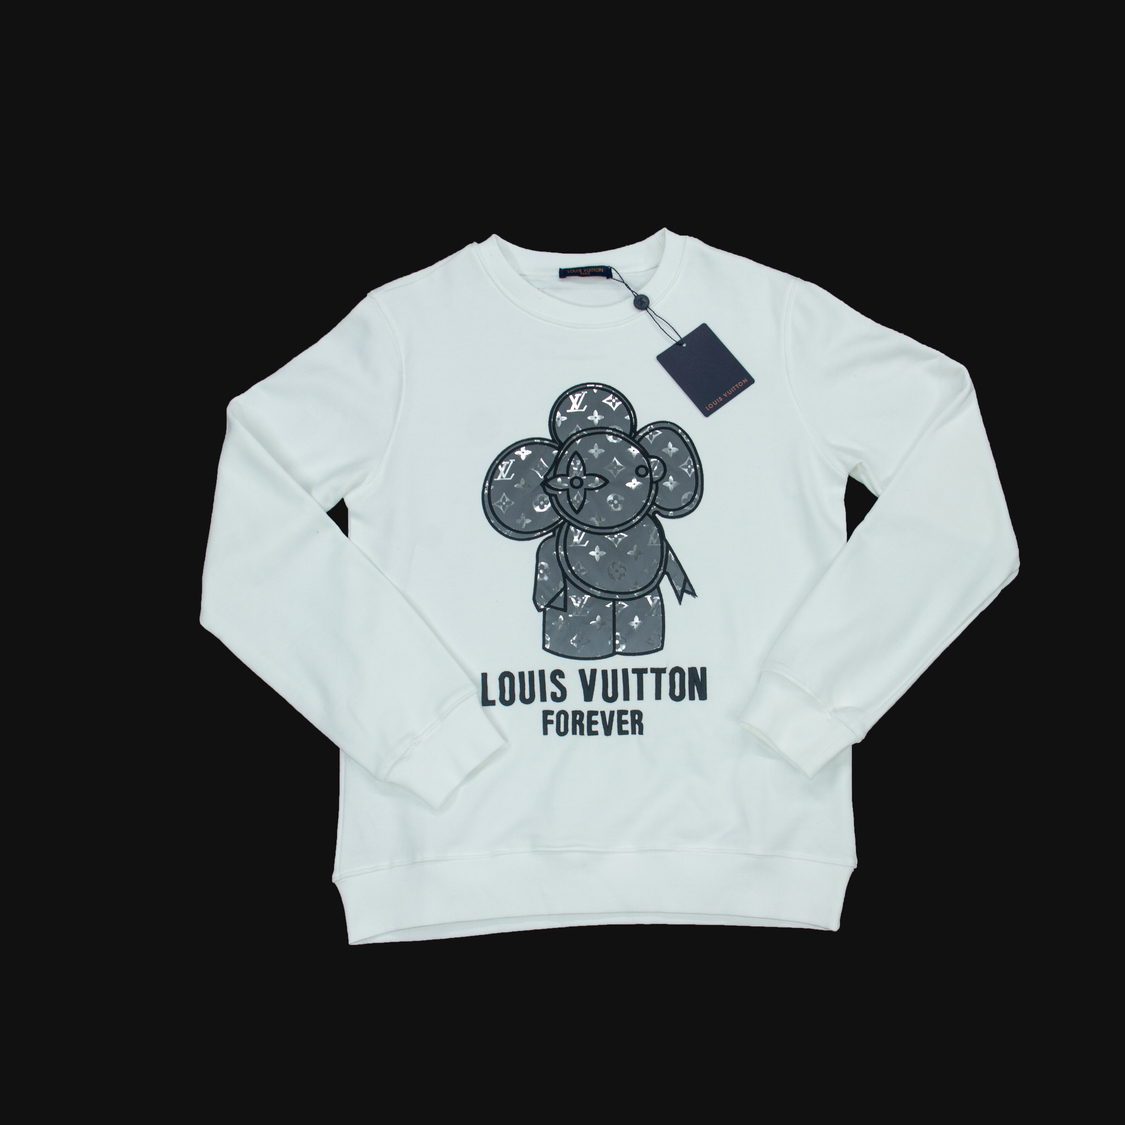 Áo nỉ Louis Vuitton forever hoa - trắng